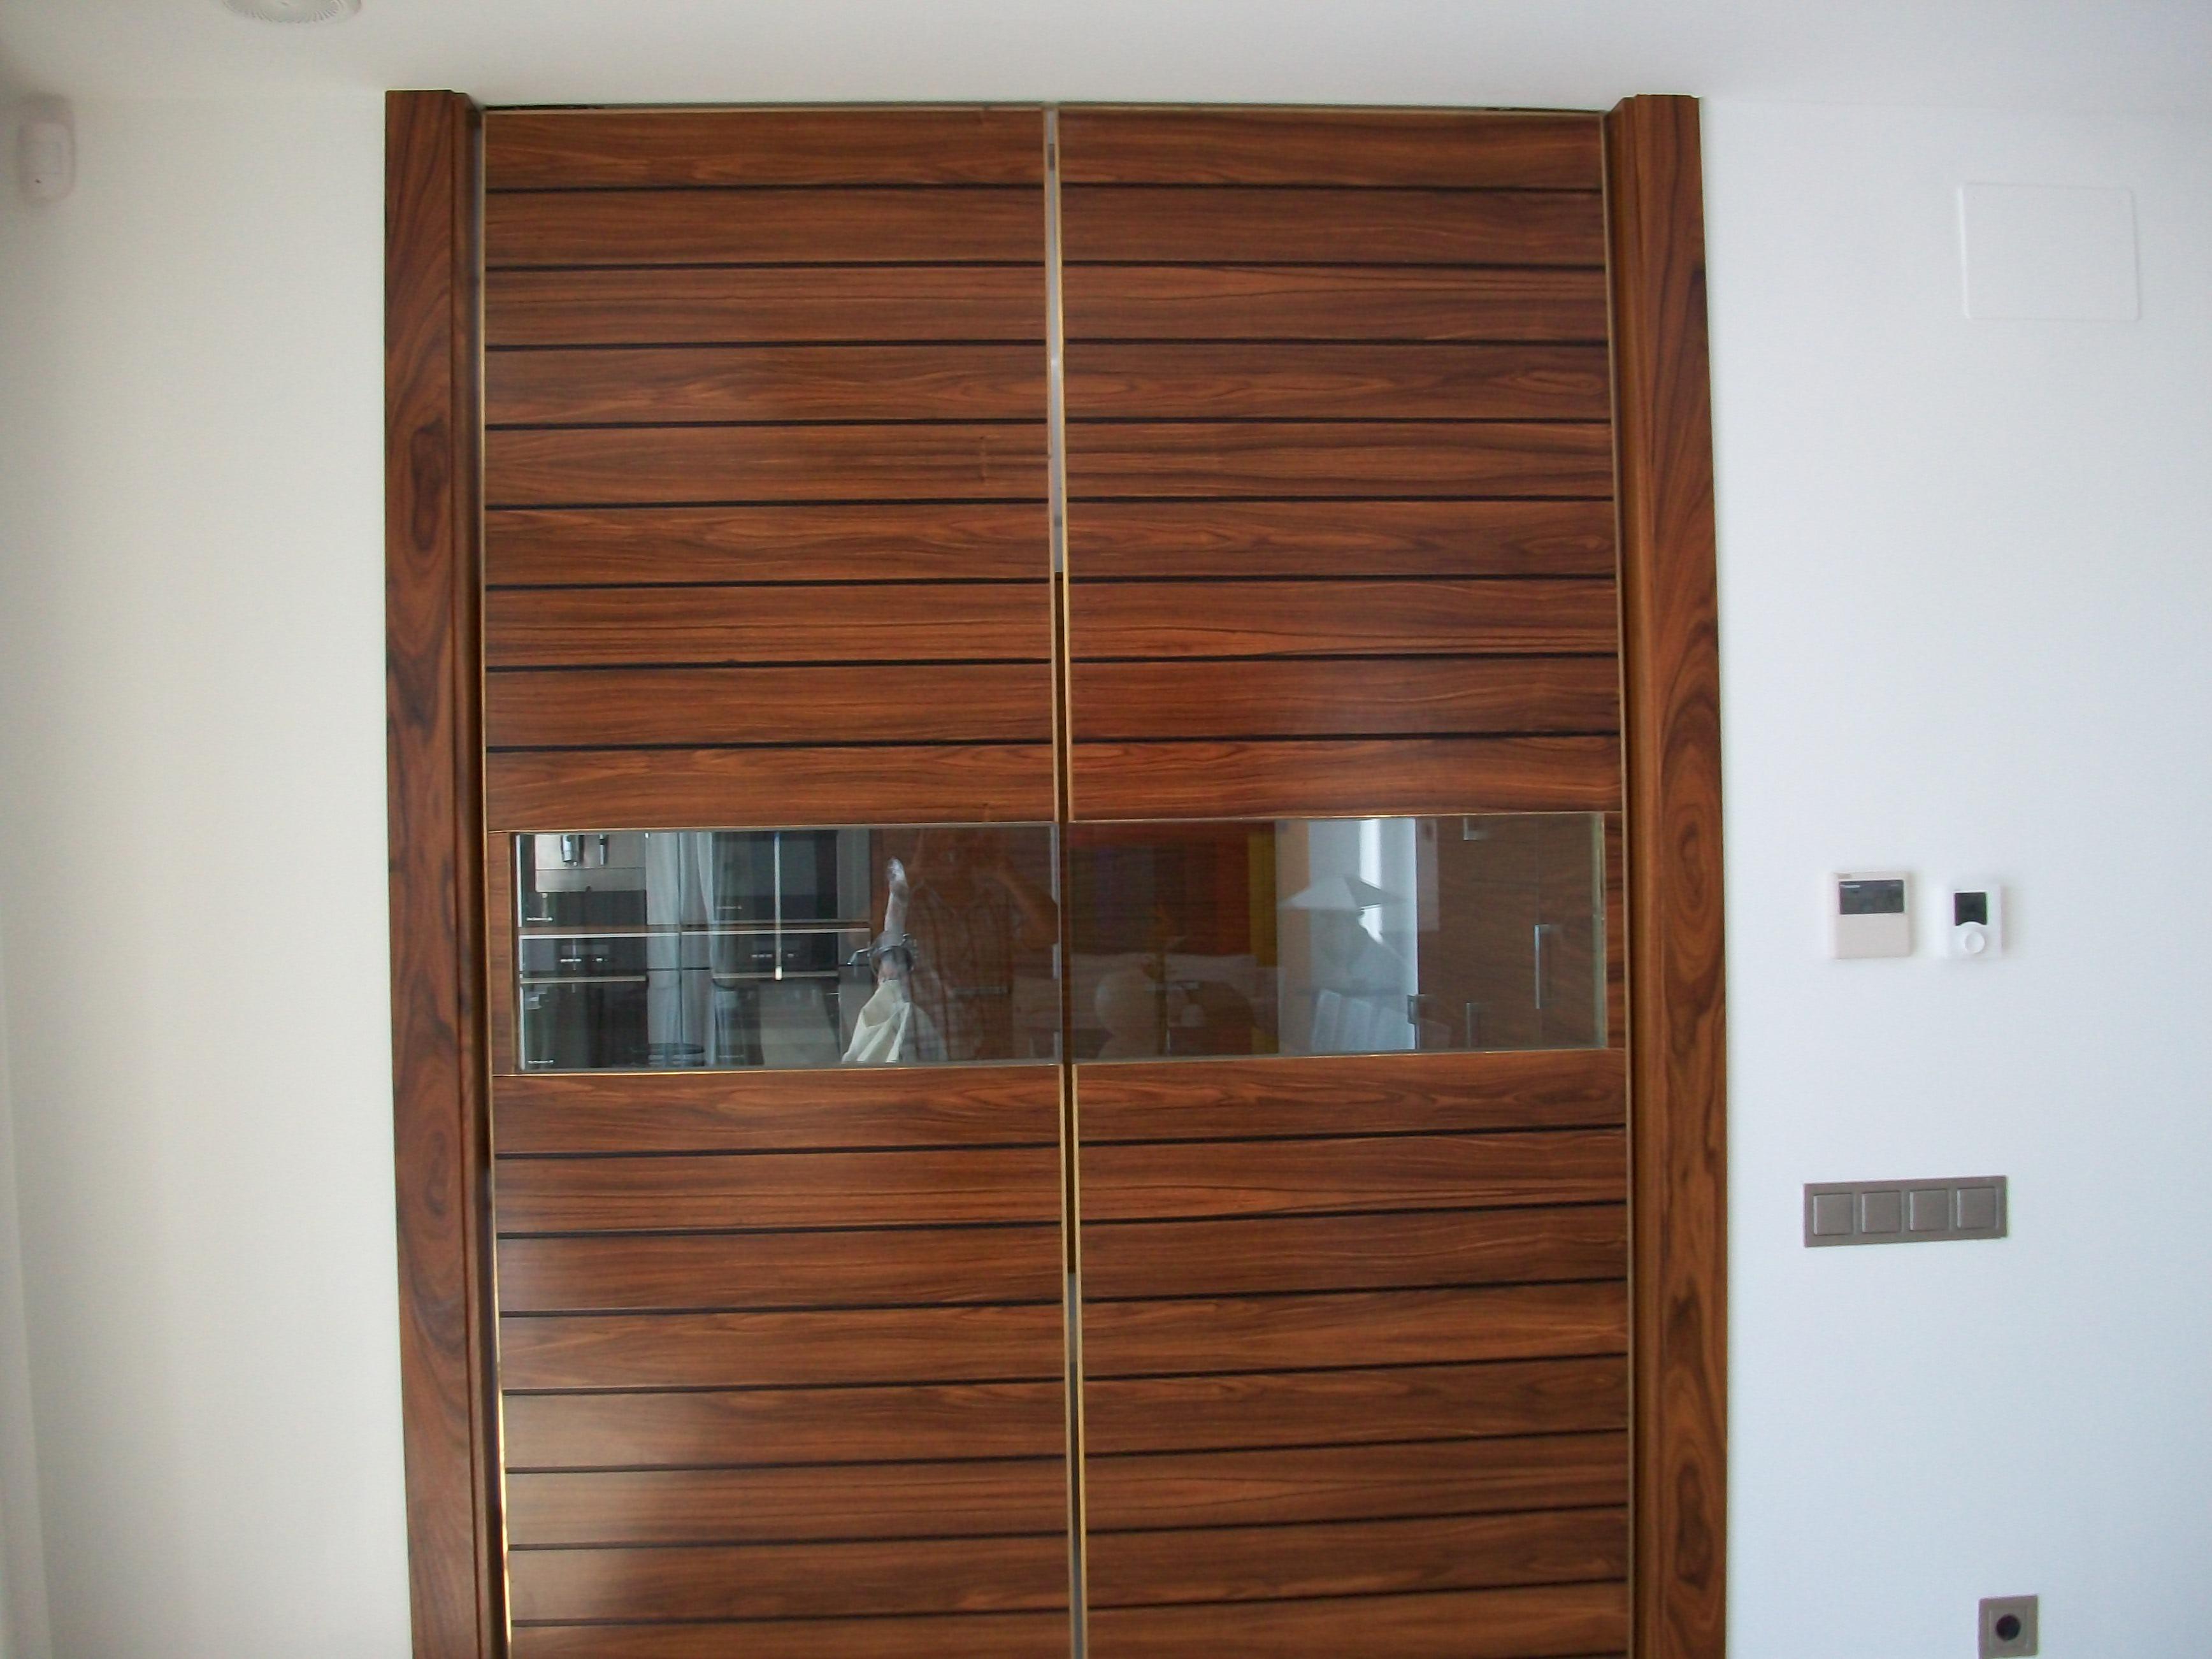 Fabricacion fabrica puertas de paso interior a medida - Medidas puertas interior ...